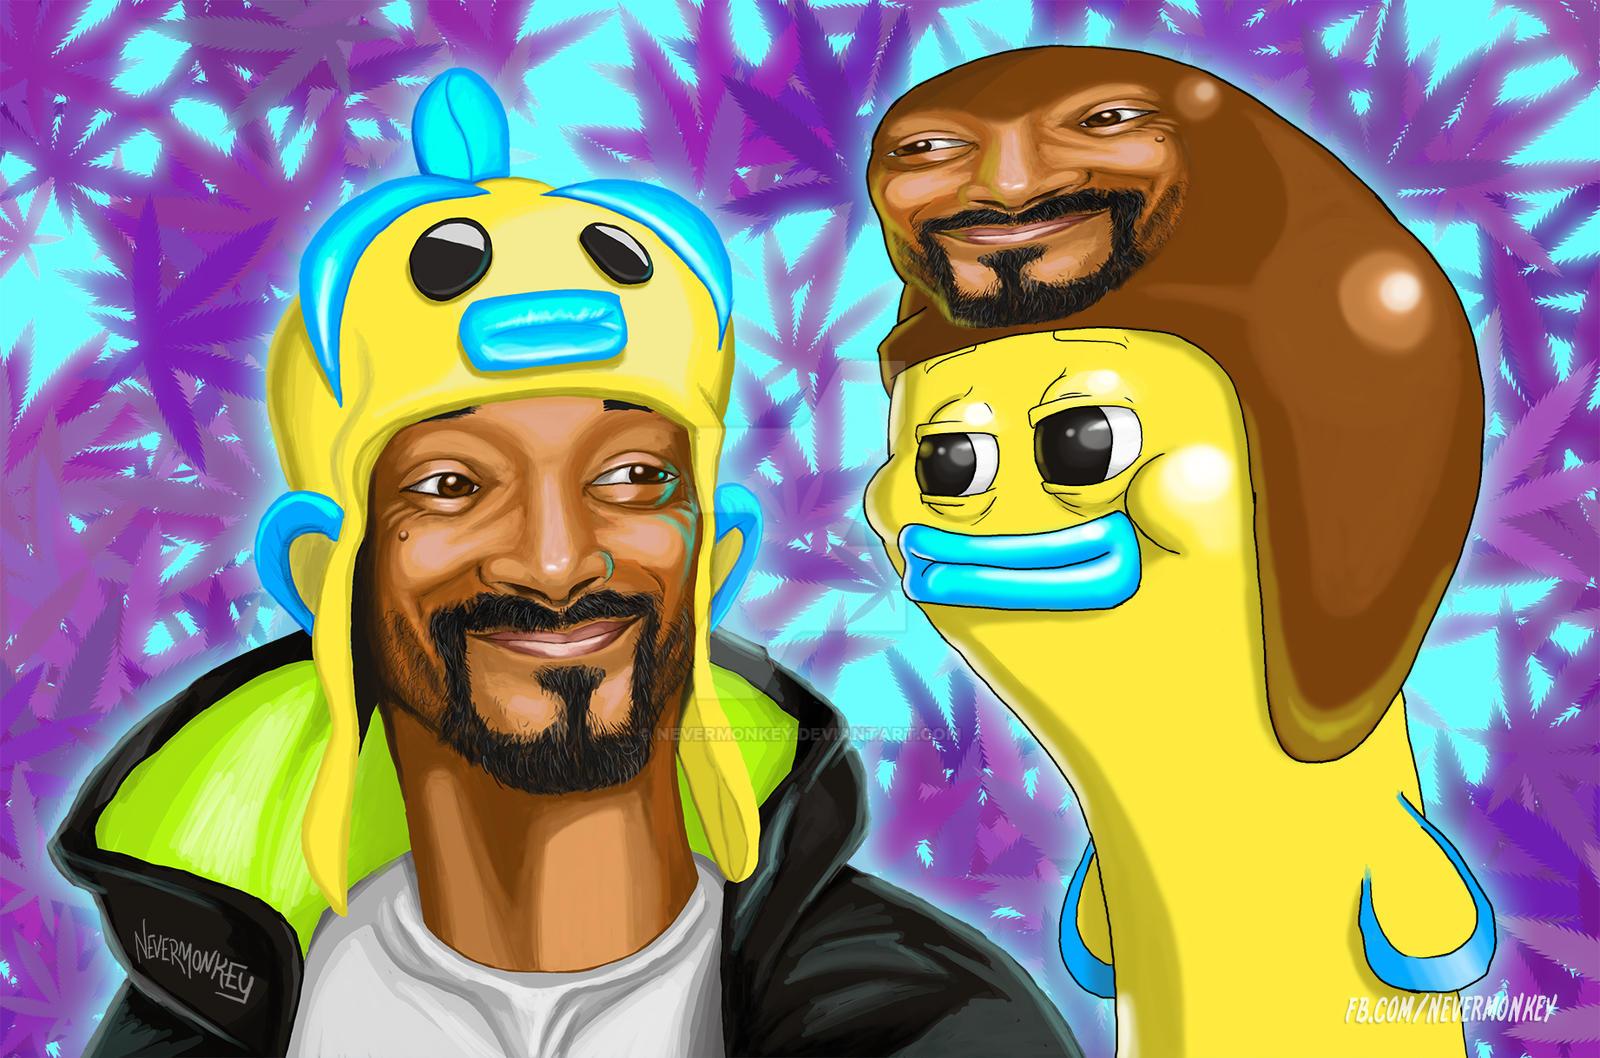 672885 nevermonkey artist e621 for Snoop dogg fish hat